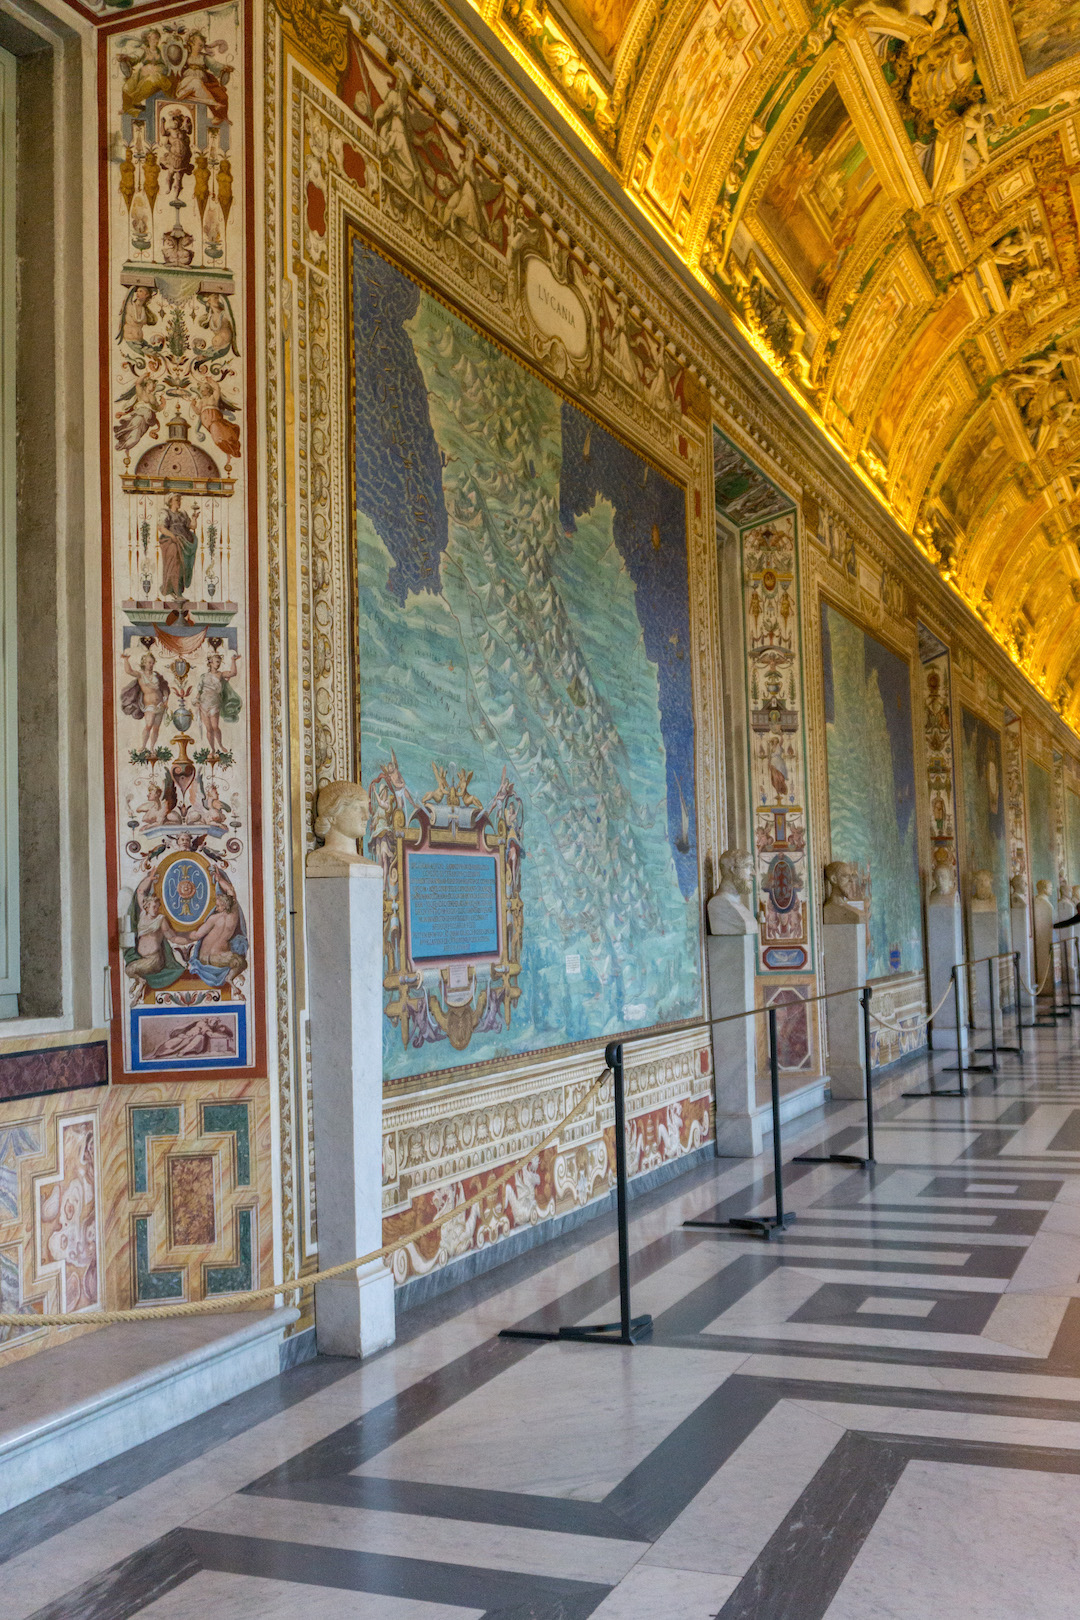 Her_Travel_Edit_Rome_Vatican_Maps_Room